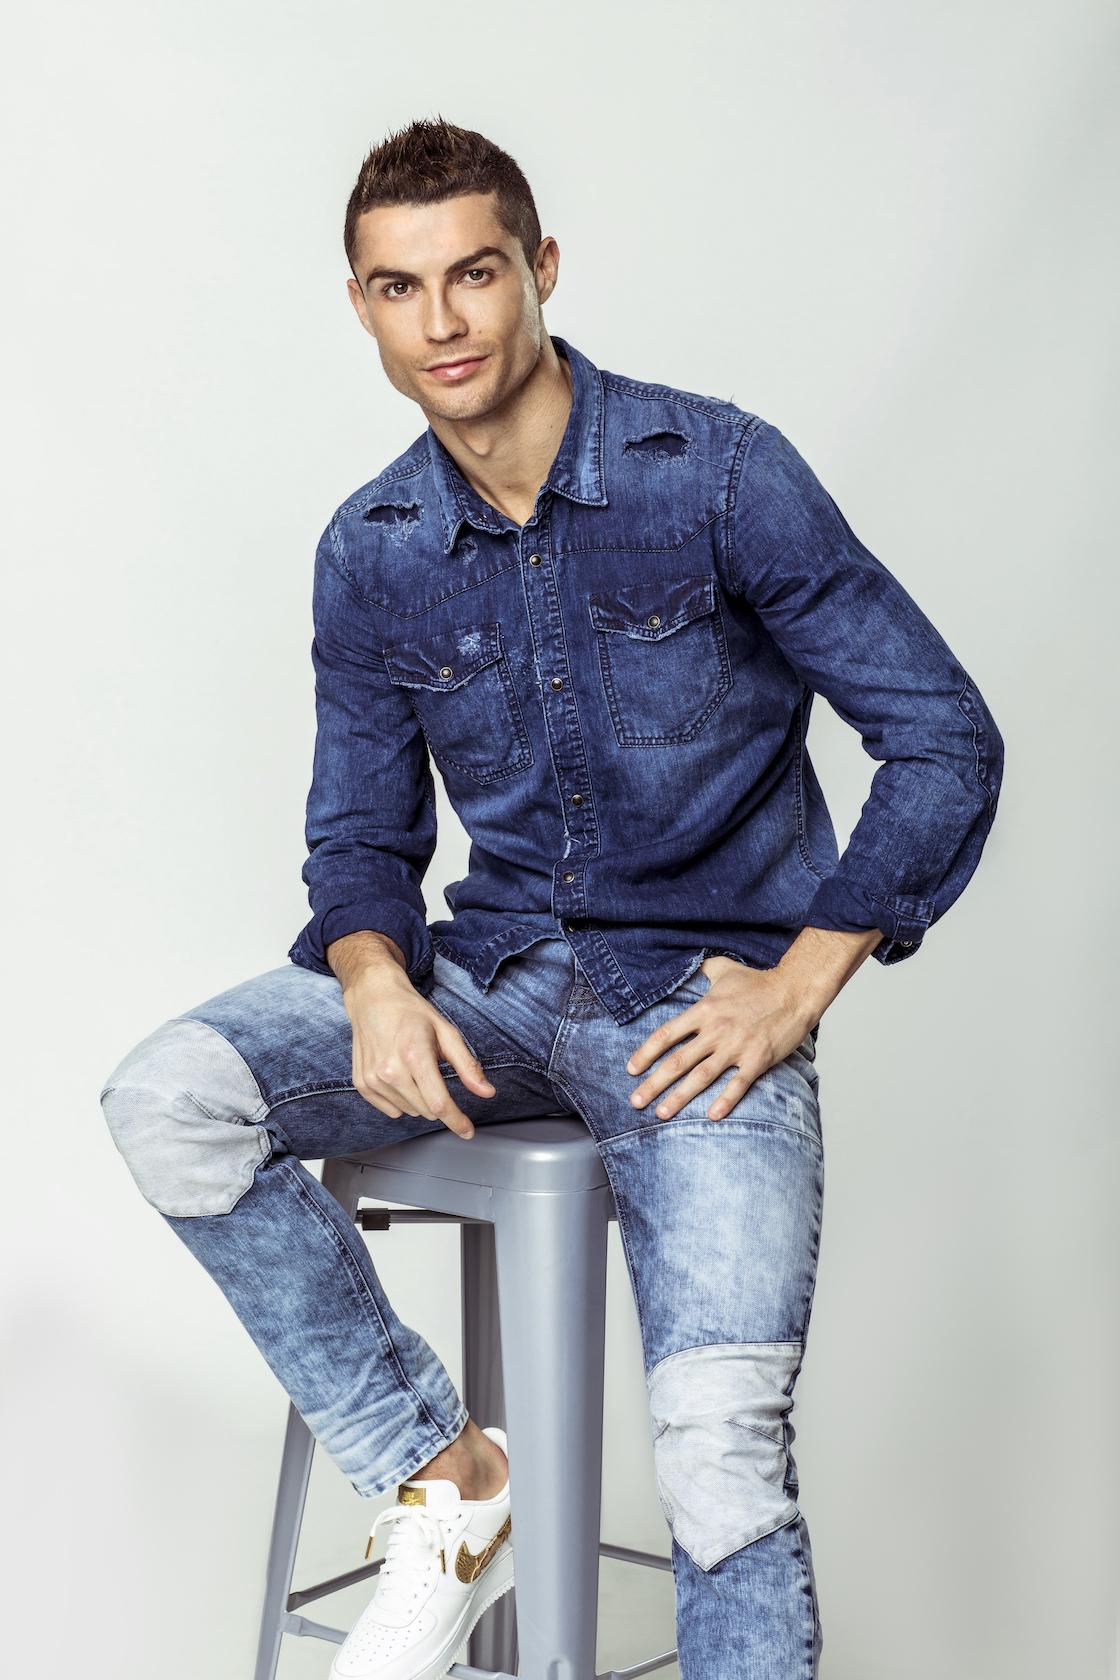 Cristiano Ronaldo teljesen levetkőzött – képek - Blikk.hu 65e0b90d44